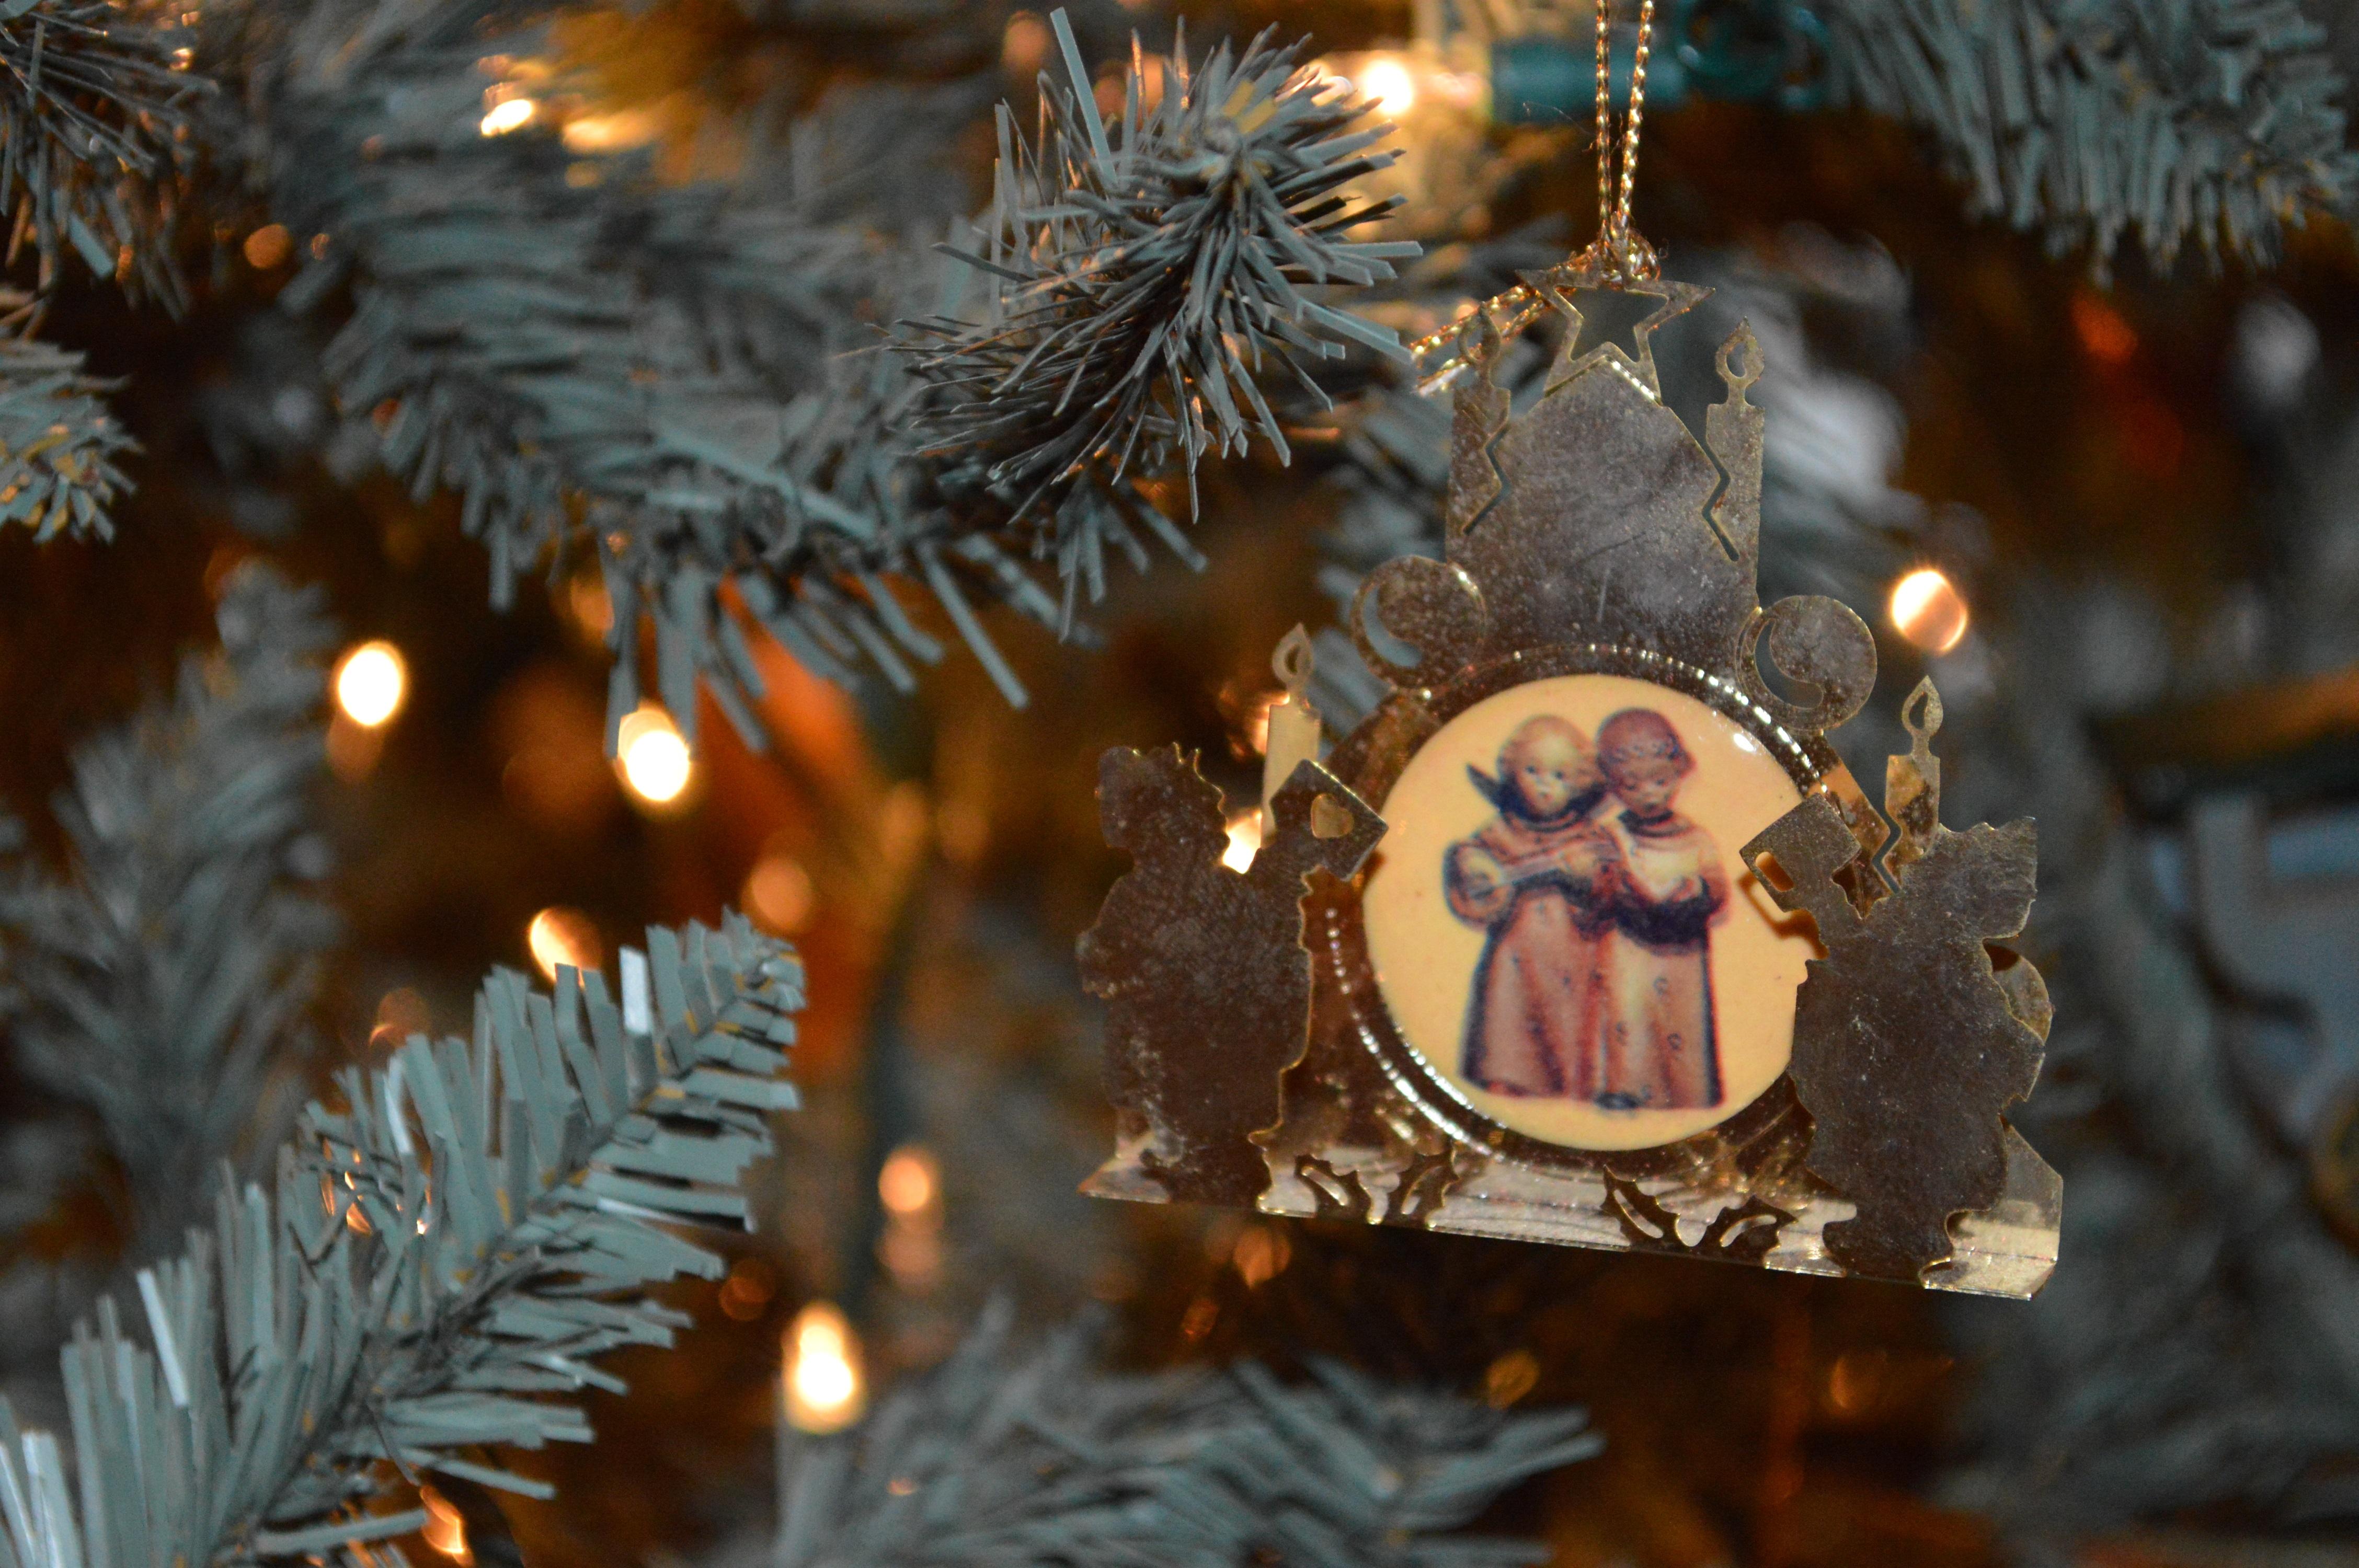 Hummel christmas tree ornaments - Toktfromgrammy1986 Lion From Grammy Birdhouse Tenthousandvillages Grammytokt Hummelfromgrammy